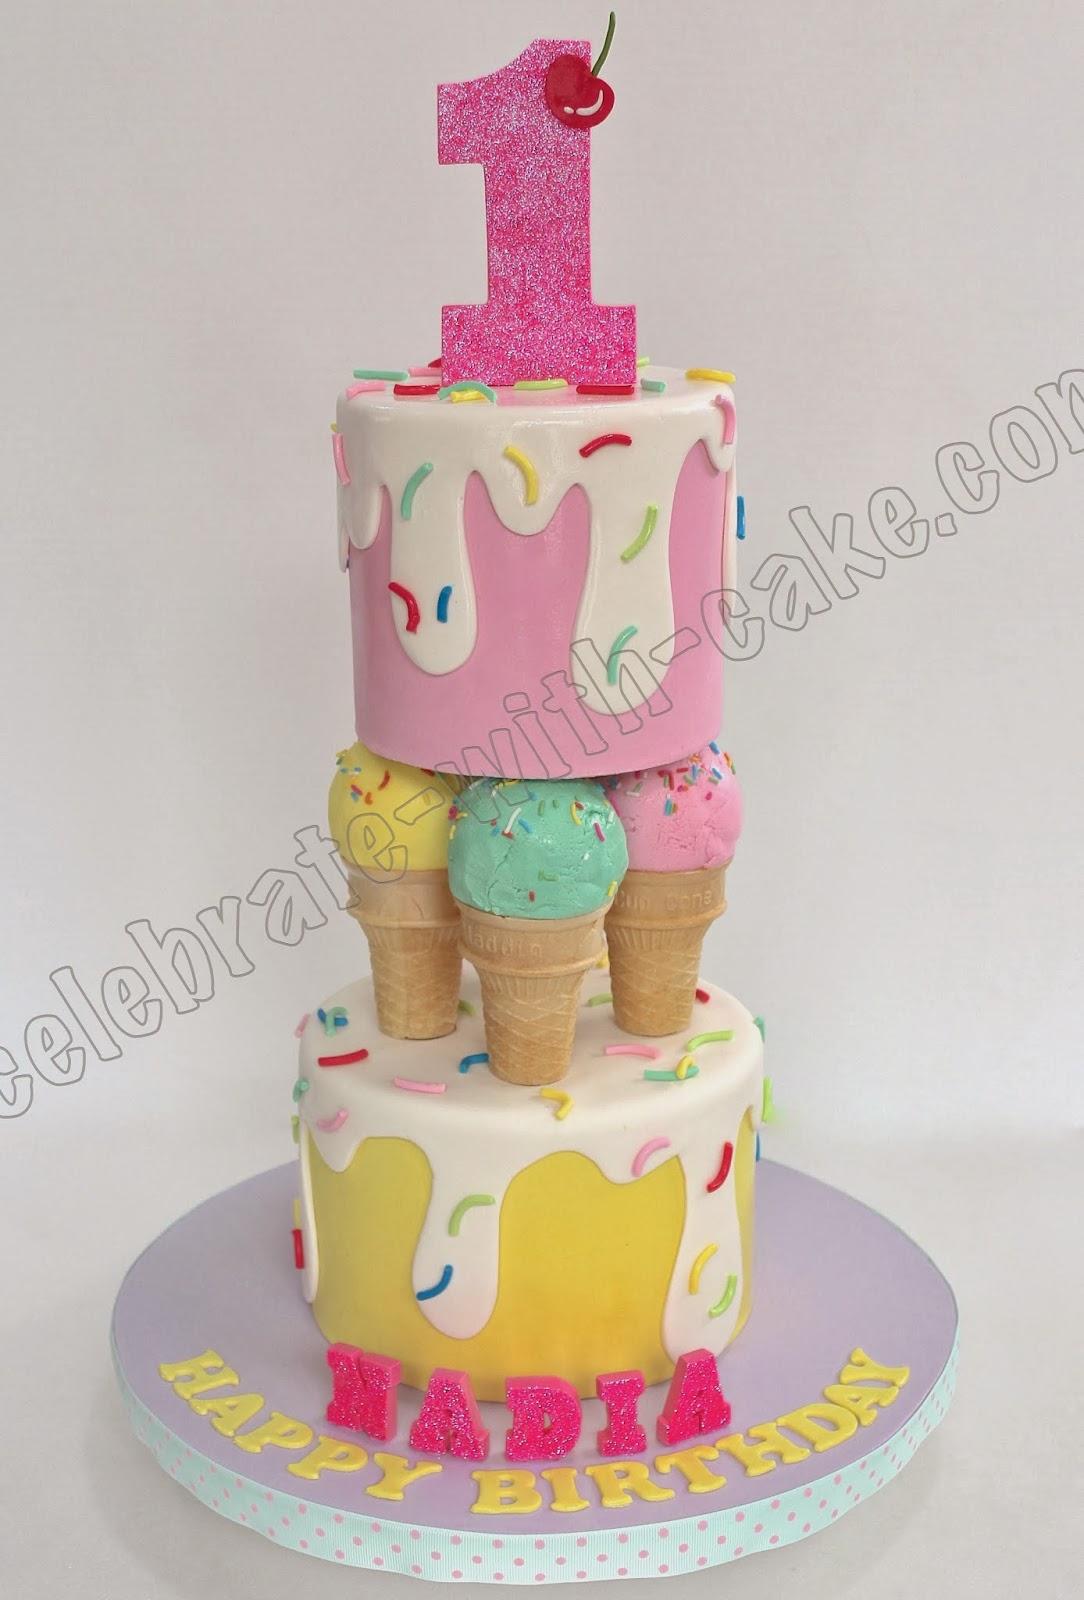 Celebrate With Cake Ice Cream Themed 1st Birthday